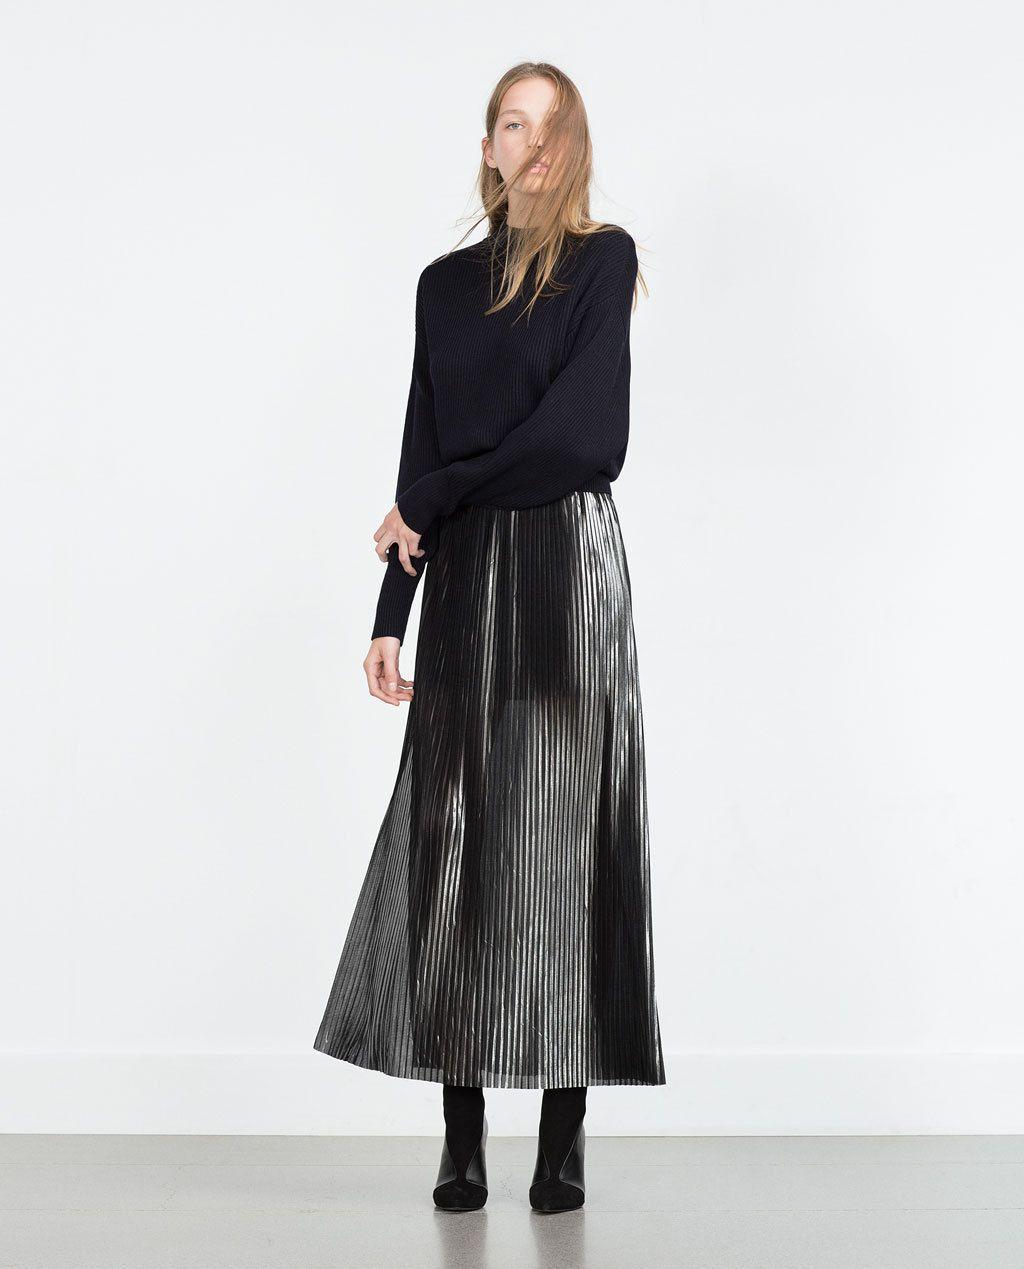 Waist High skirt flare pictures, Sofa model kayu modern